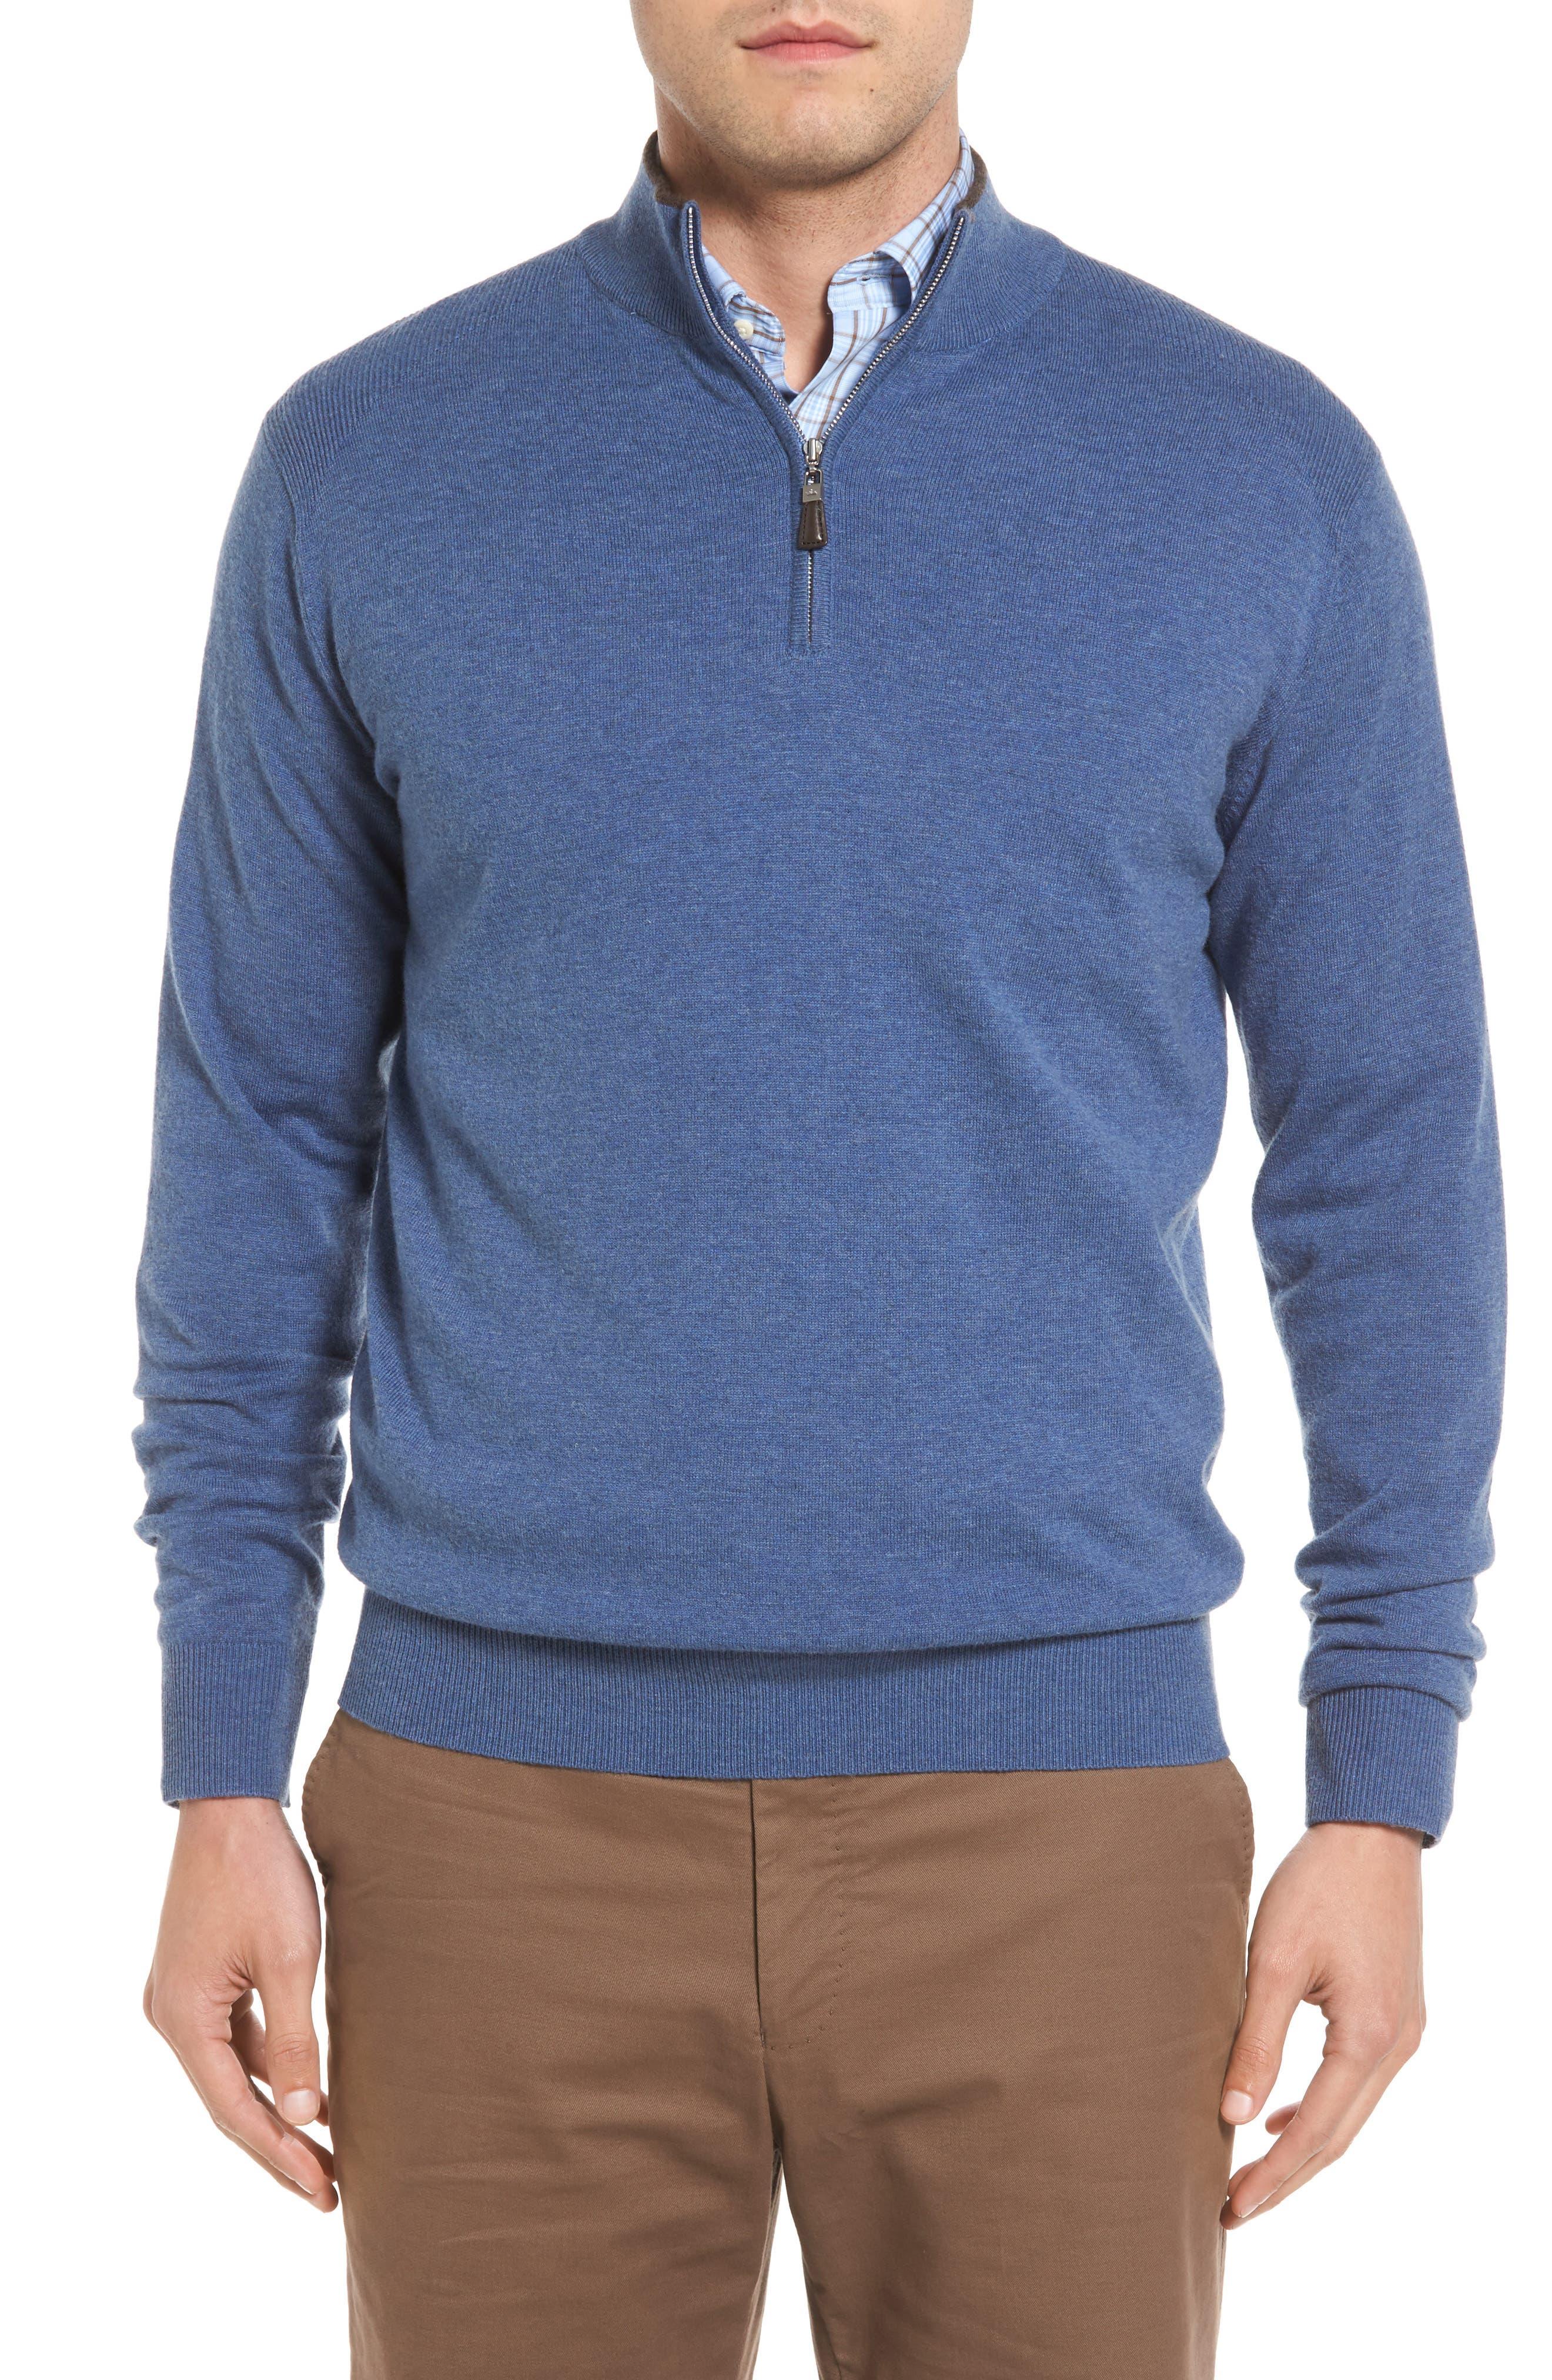 Peter Millar Mock Neck Quarter Zip Wool & Cotton Sweater